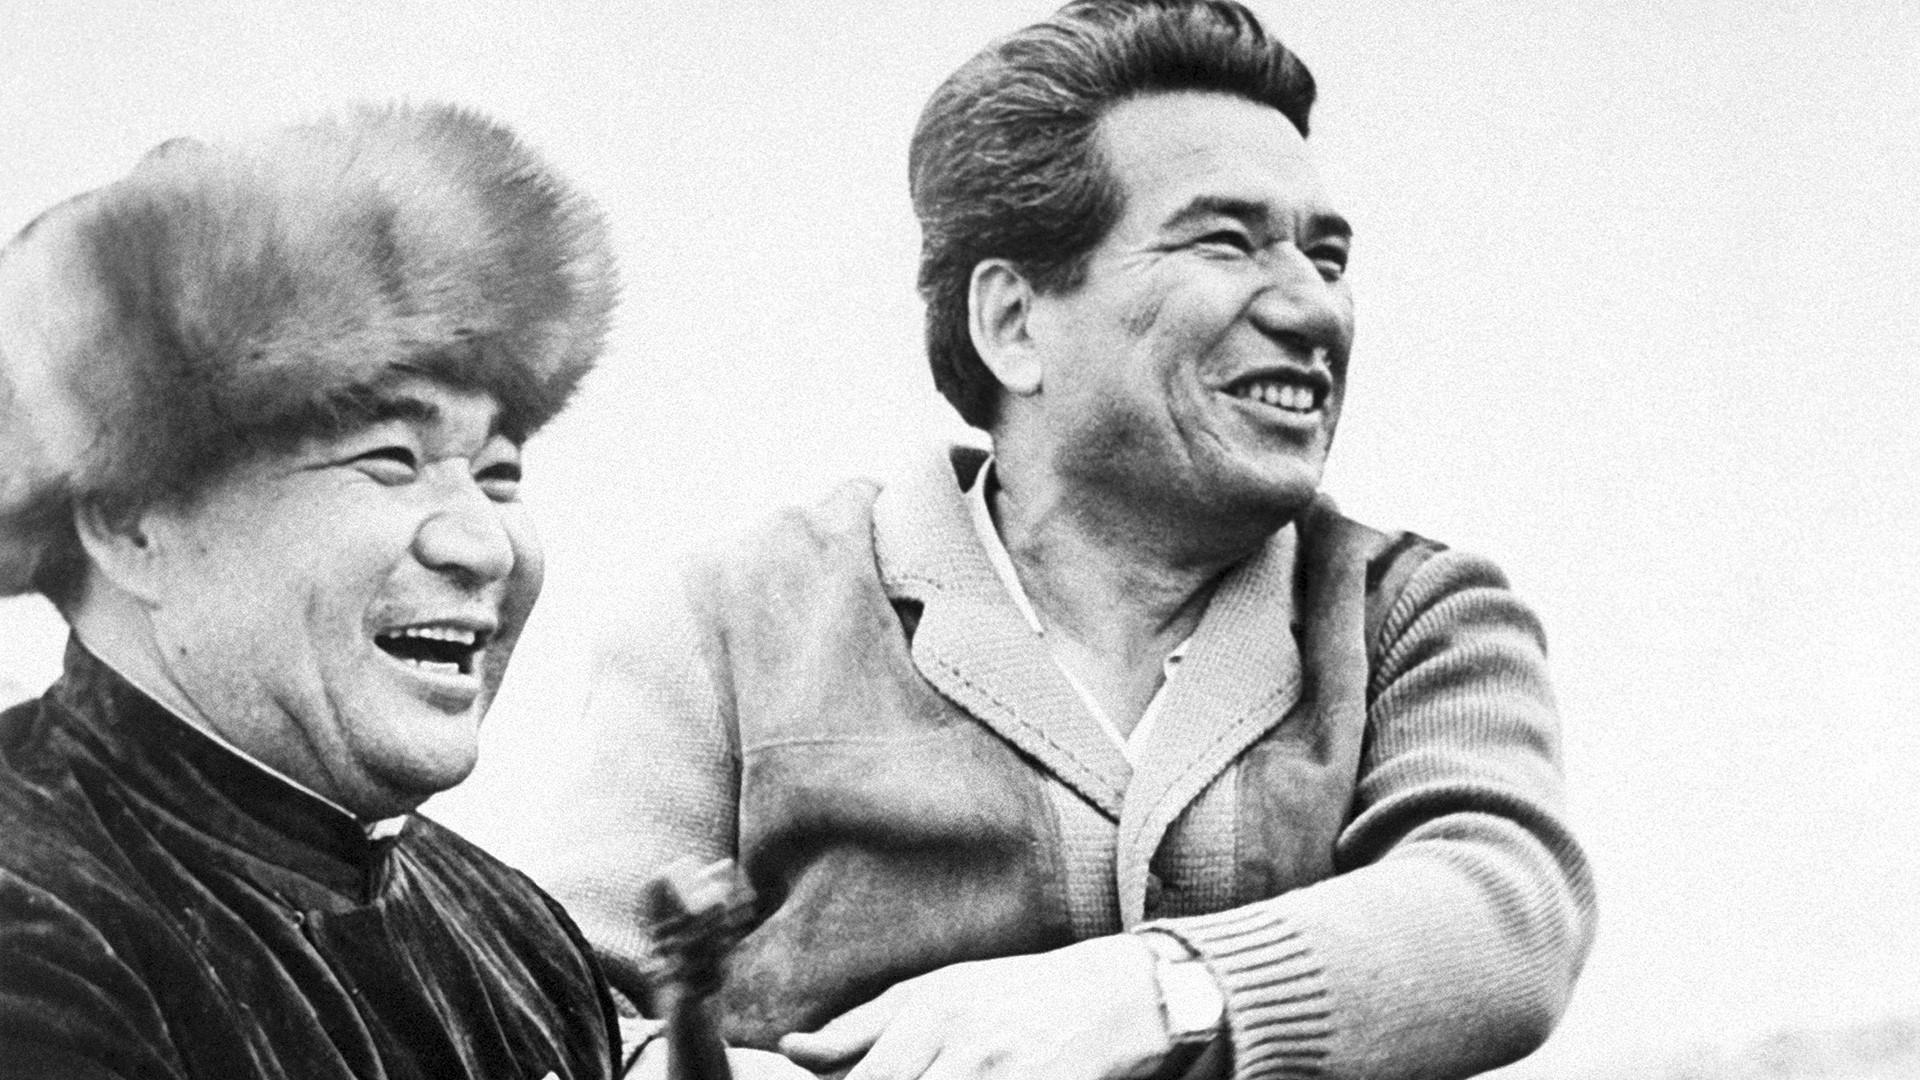 Chingiz Aitmatov (R) in Kyrgyzstan, 1973